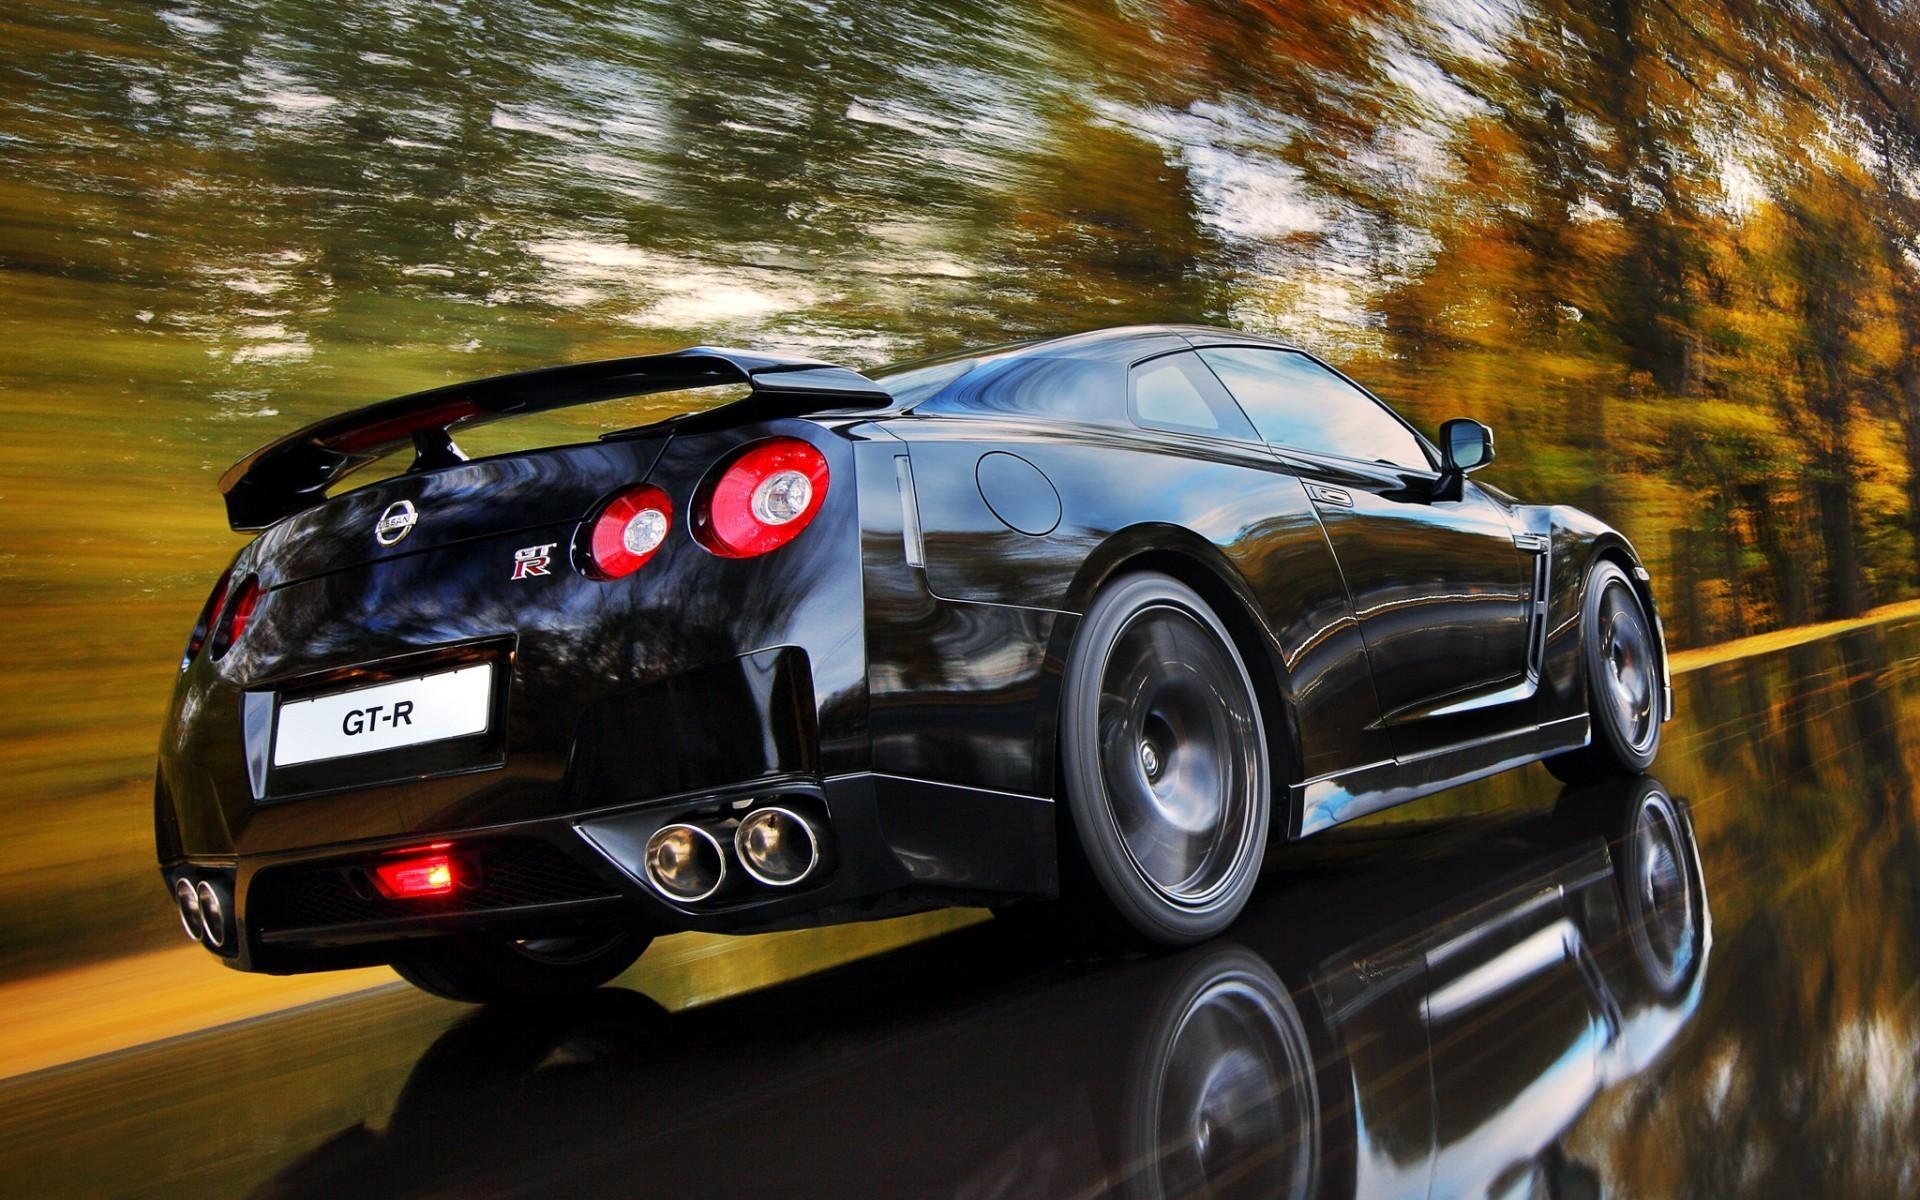 Nissan R35 GT-R cars motion blur